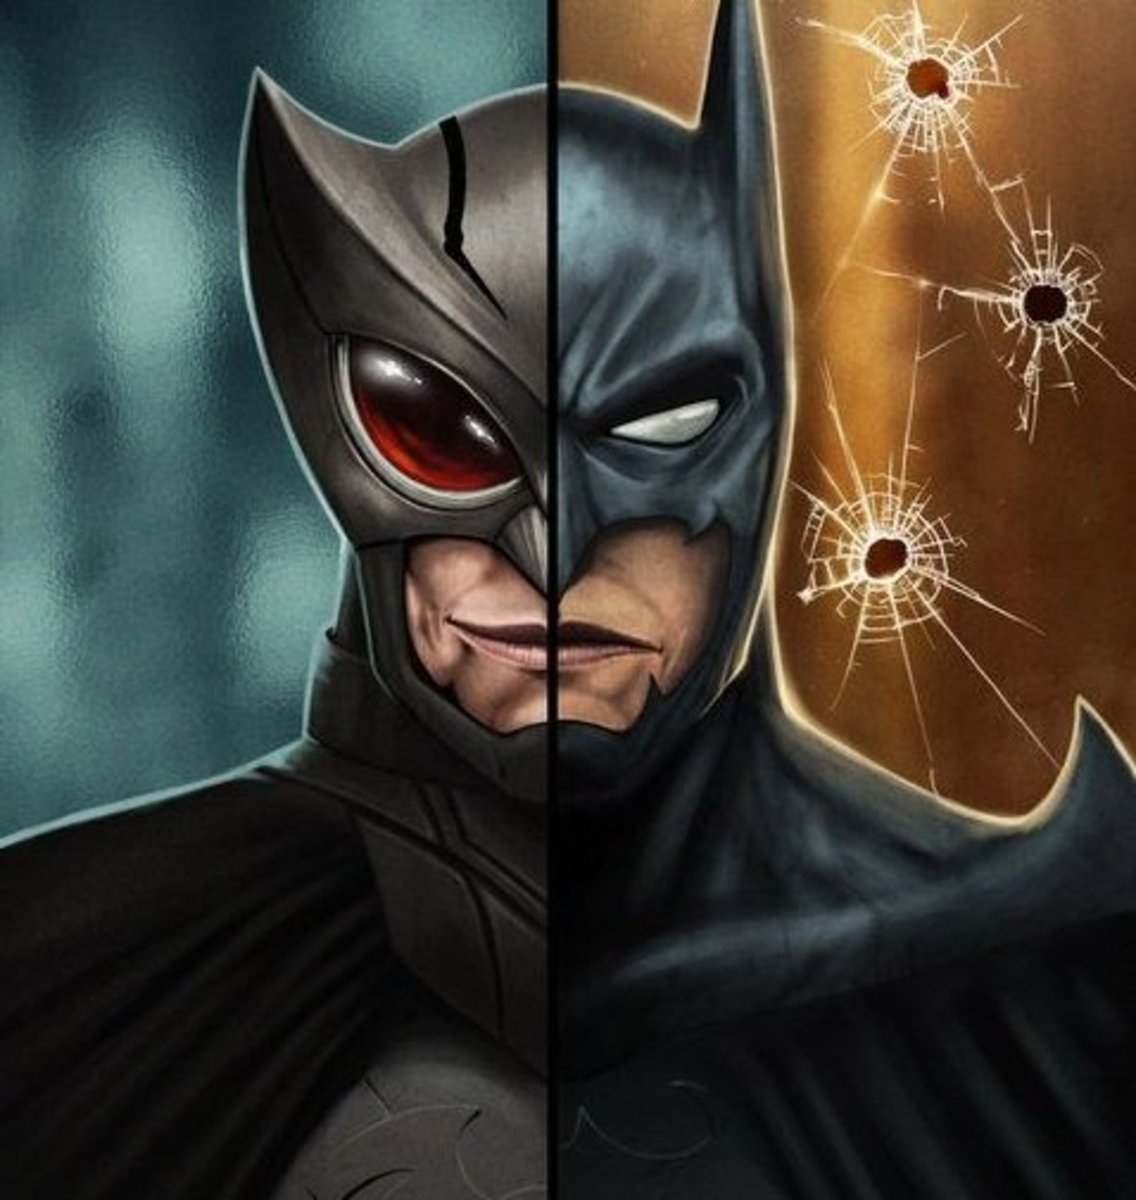 Owlman and Batman